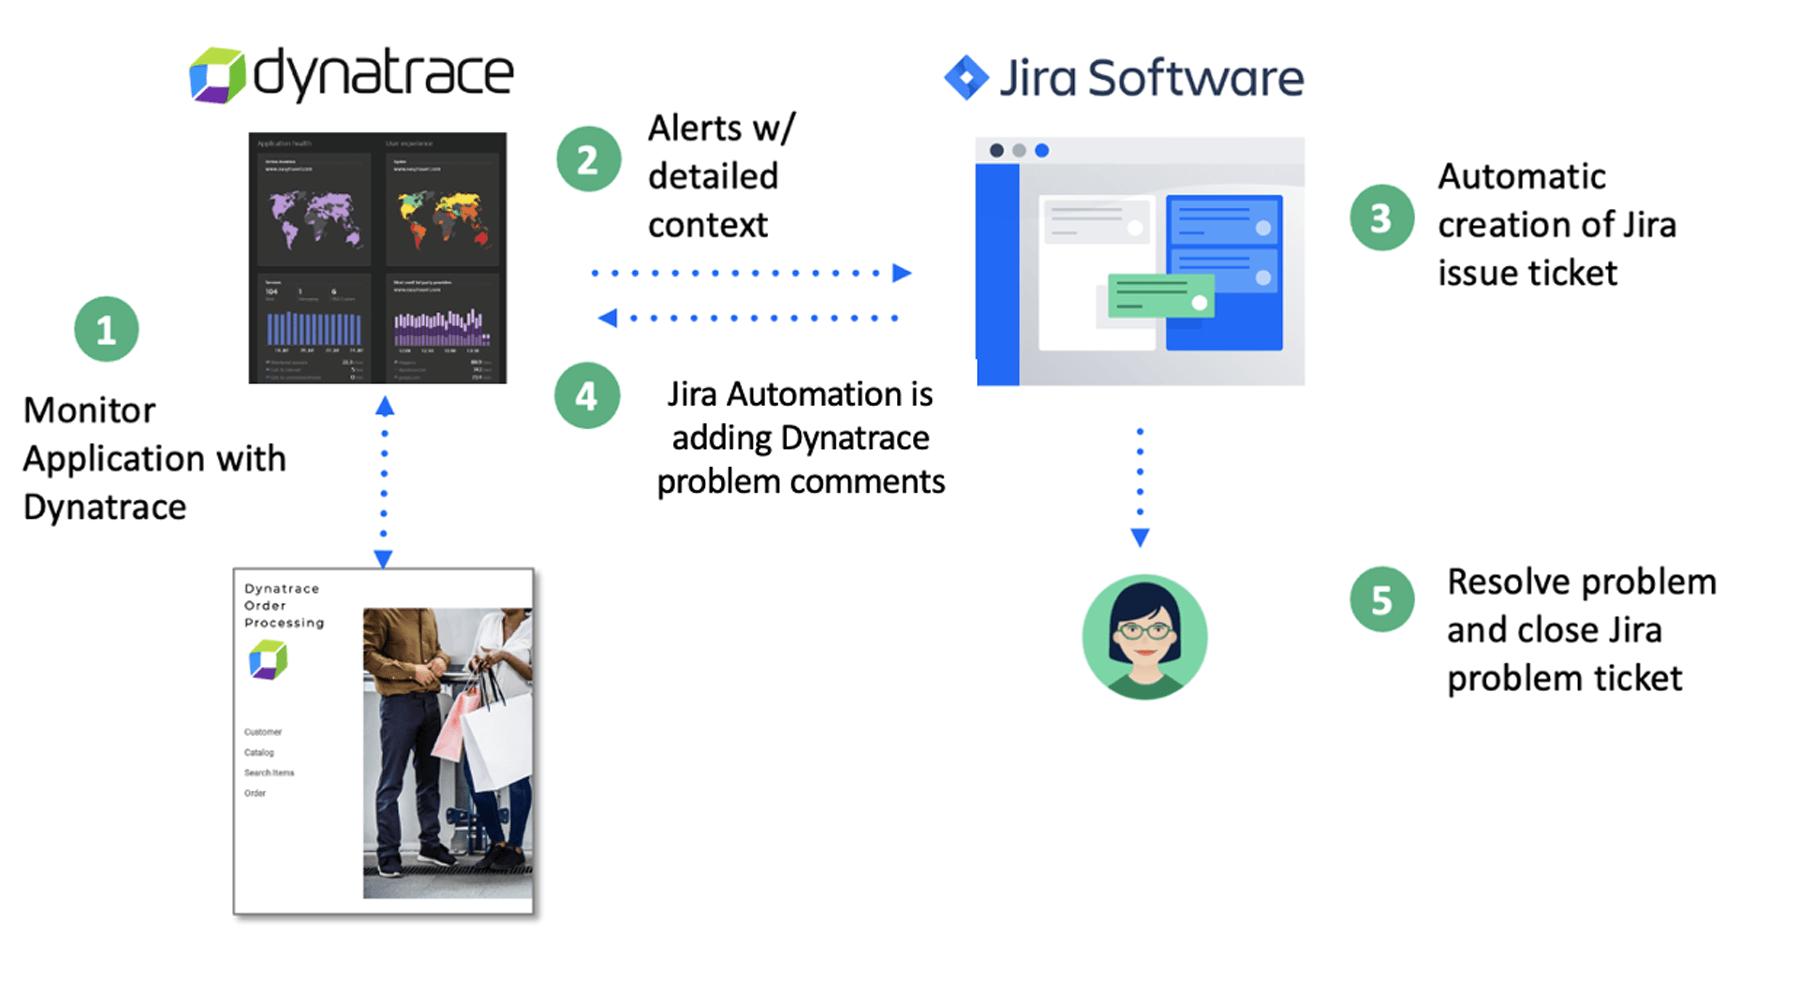 Diagram using dynatrace and jira